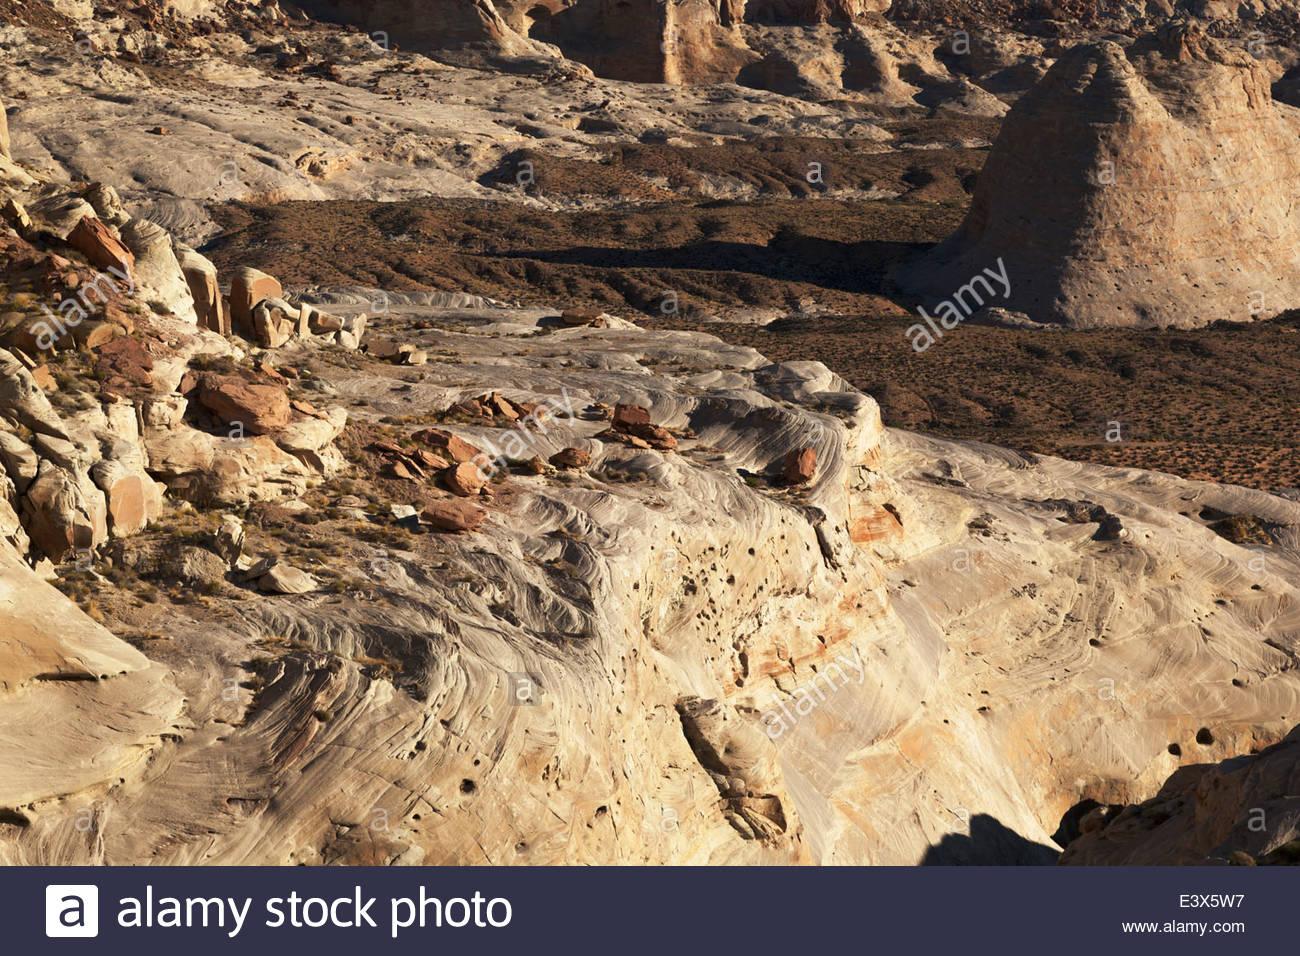 Swirls in Sandstone near Stud Horse Point northern Arizona - Stock Image